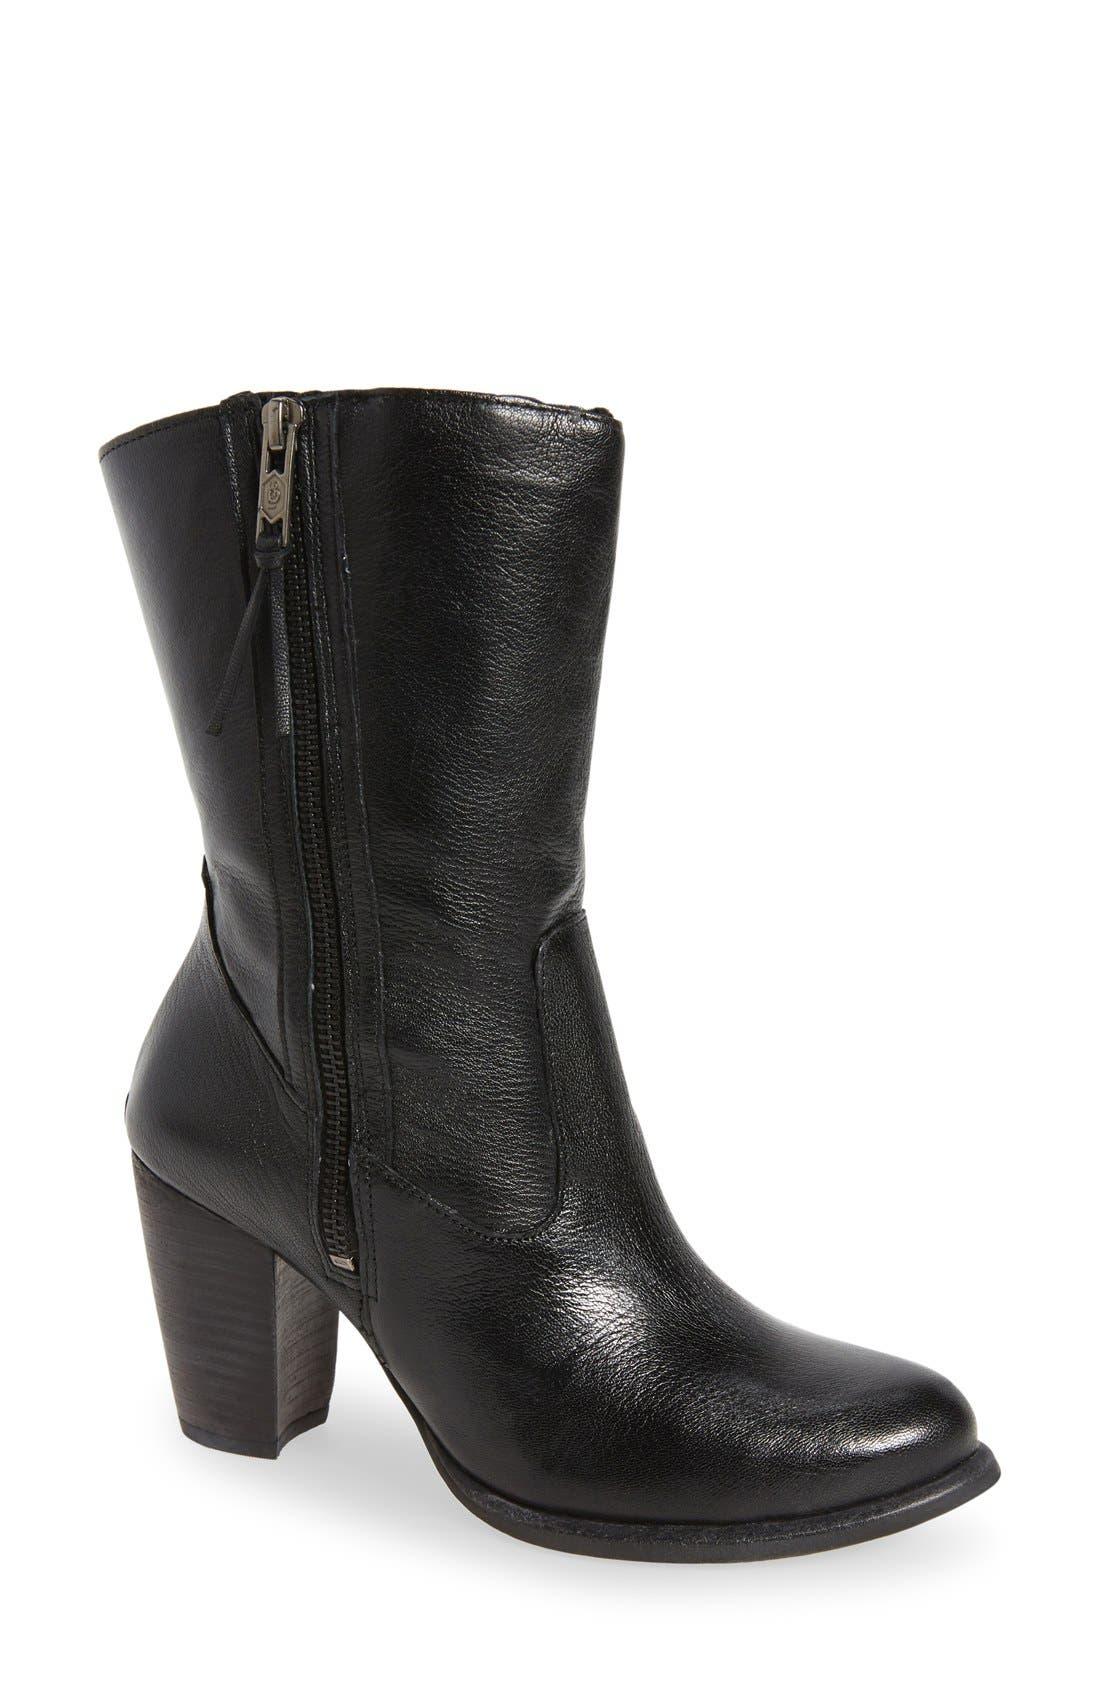 Main Image - UGG® 'Lynda' Block Heel Boot (Women)